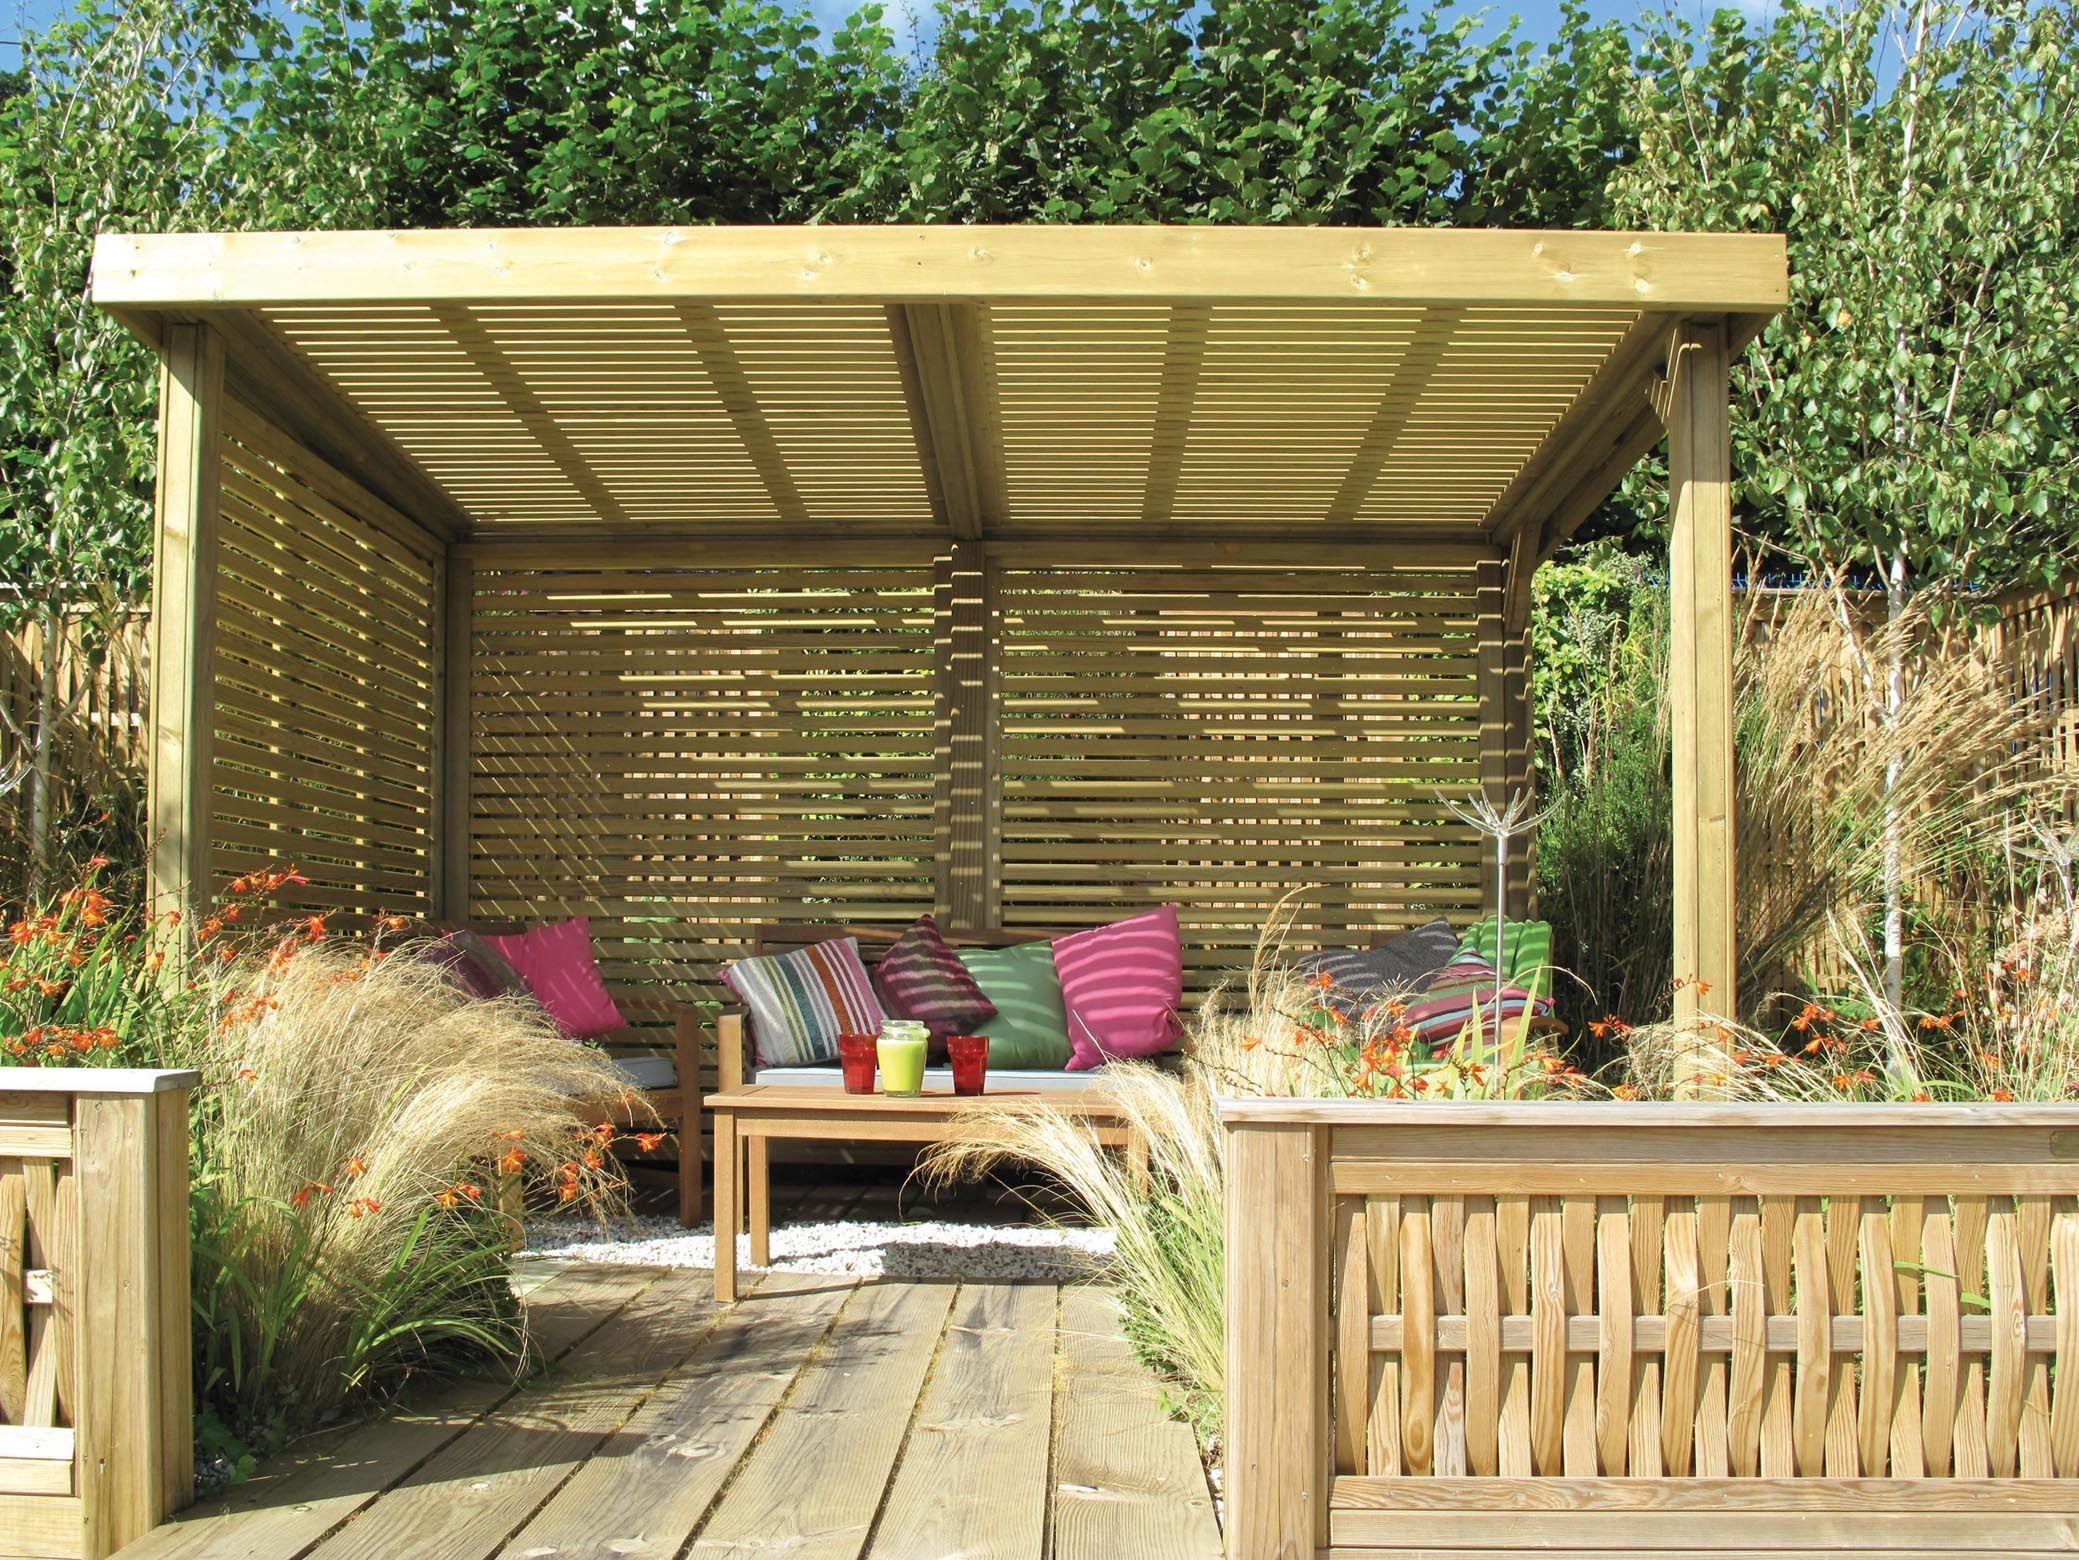 The Retreat Garden Shelter has been designed using ...